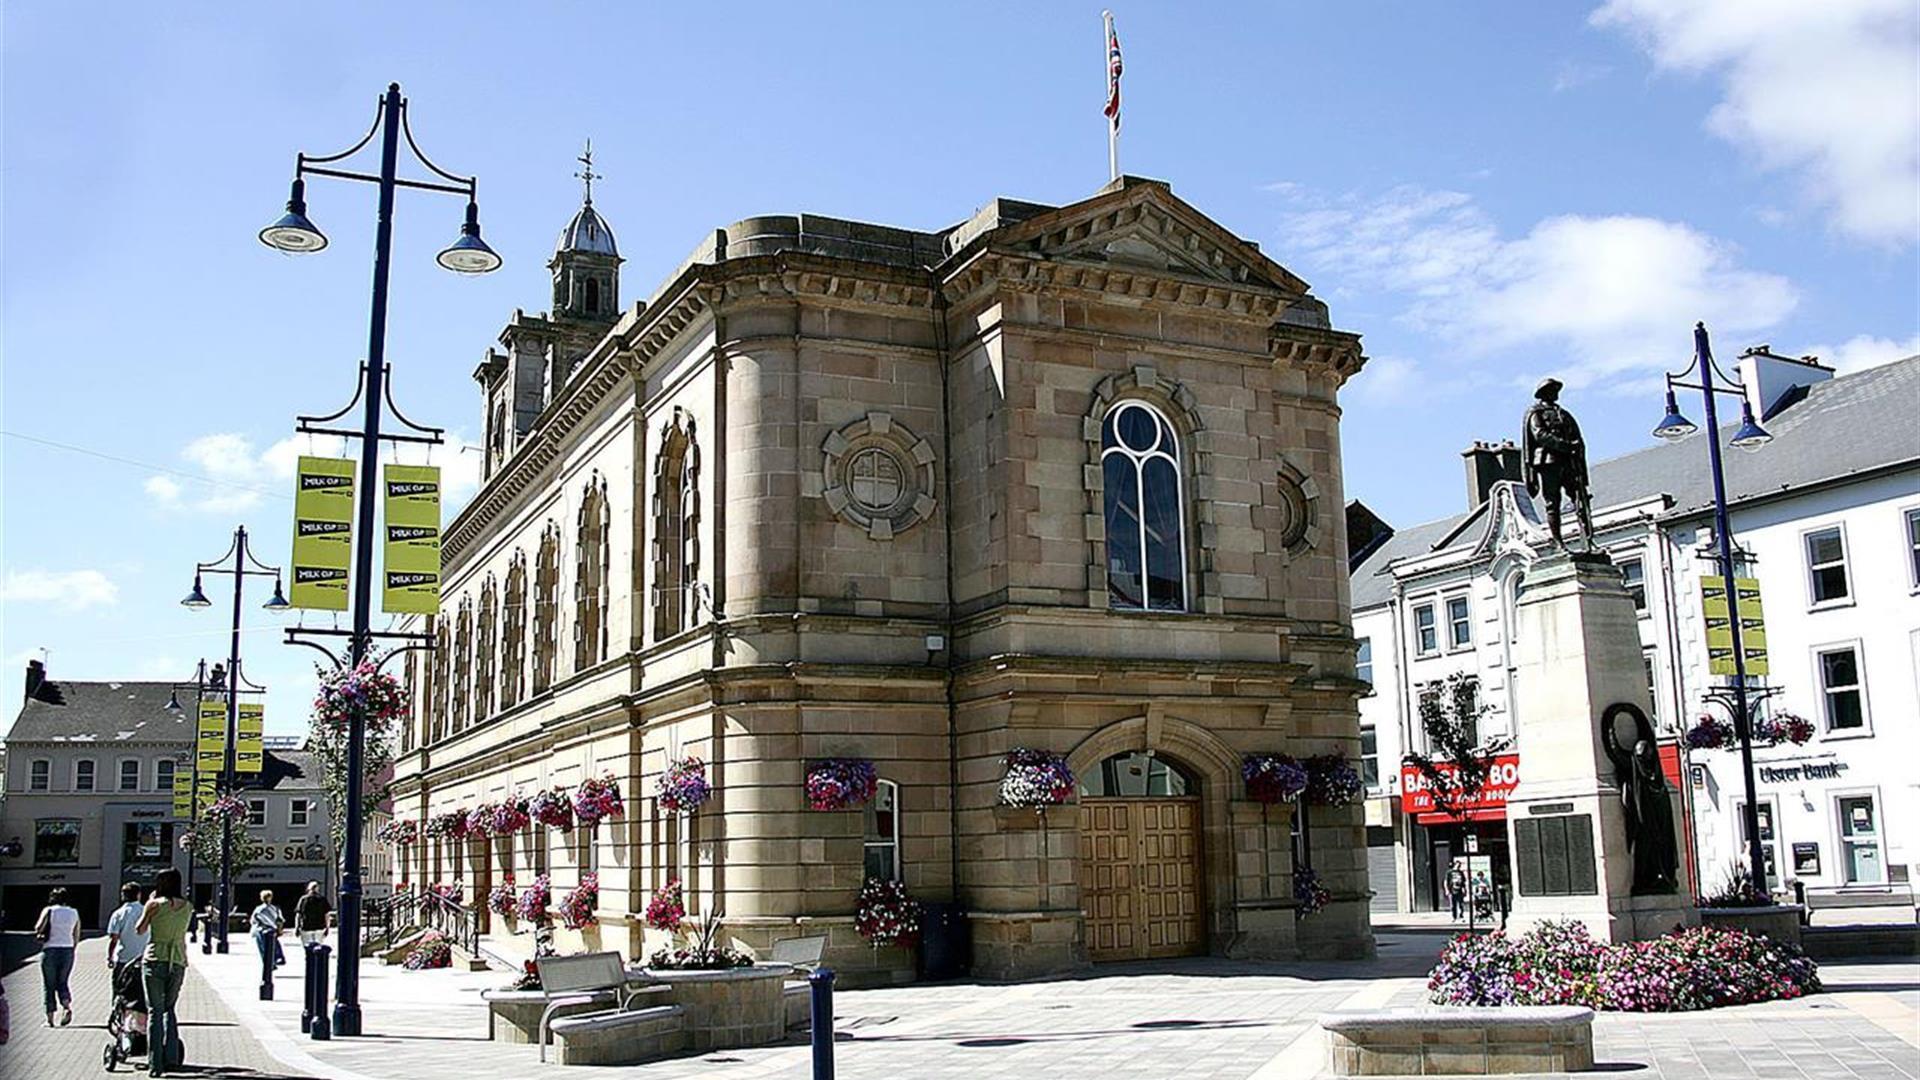 Coleraine Town Hall